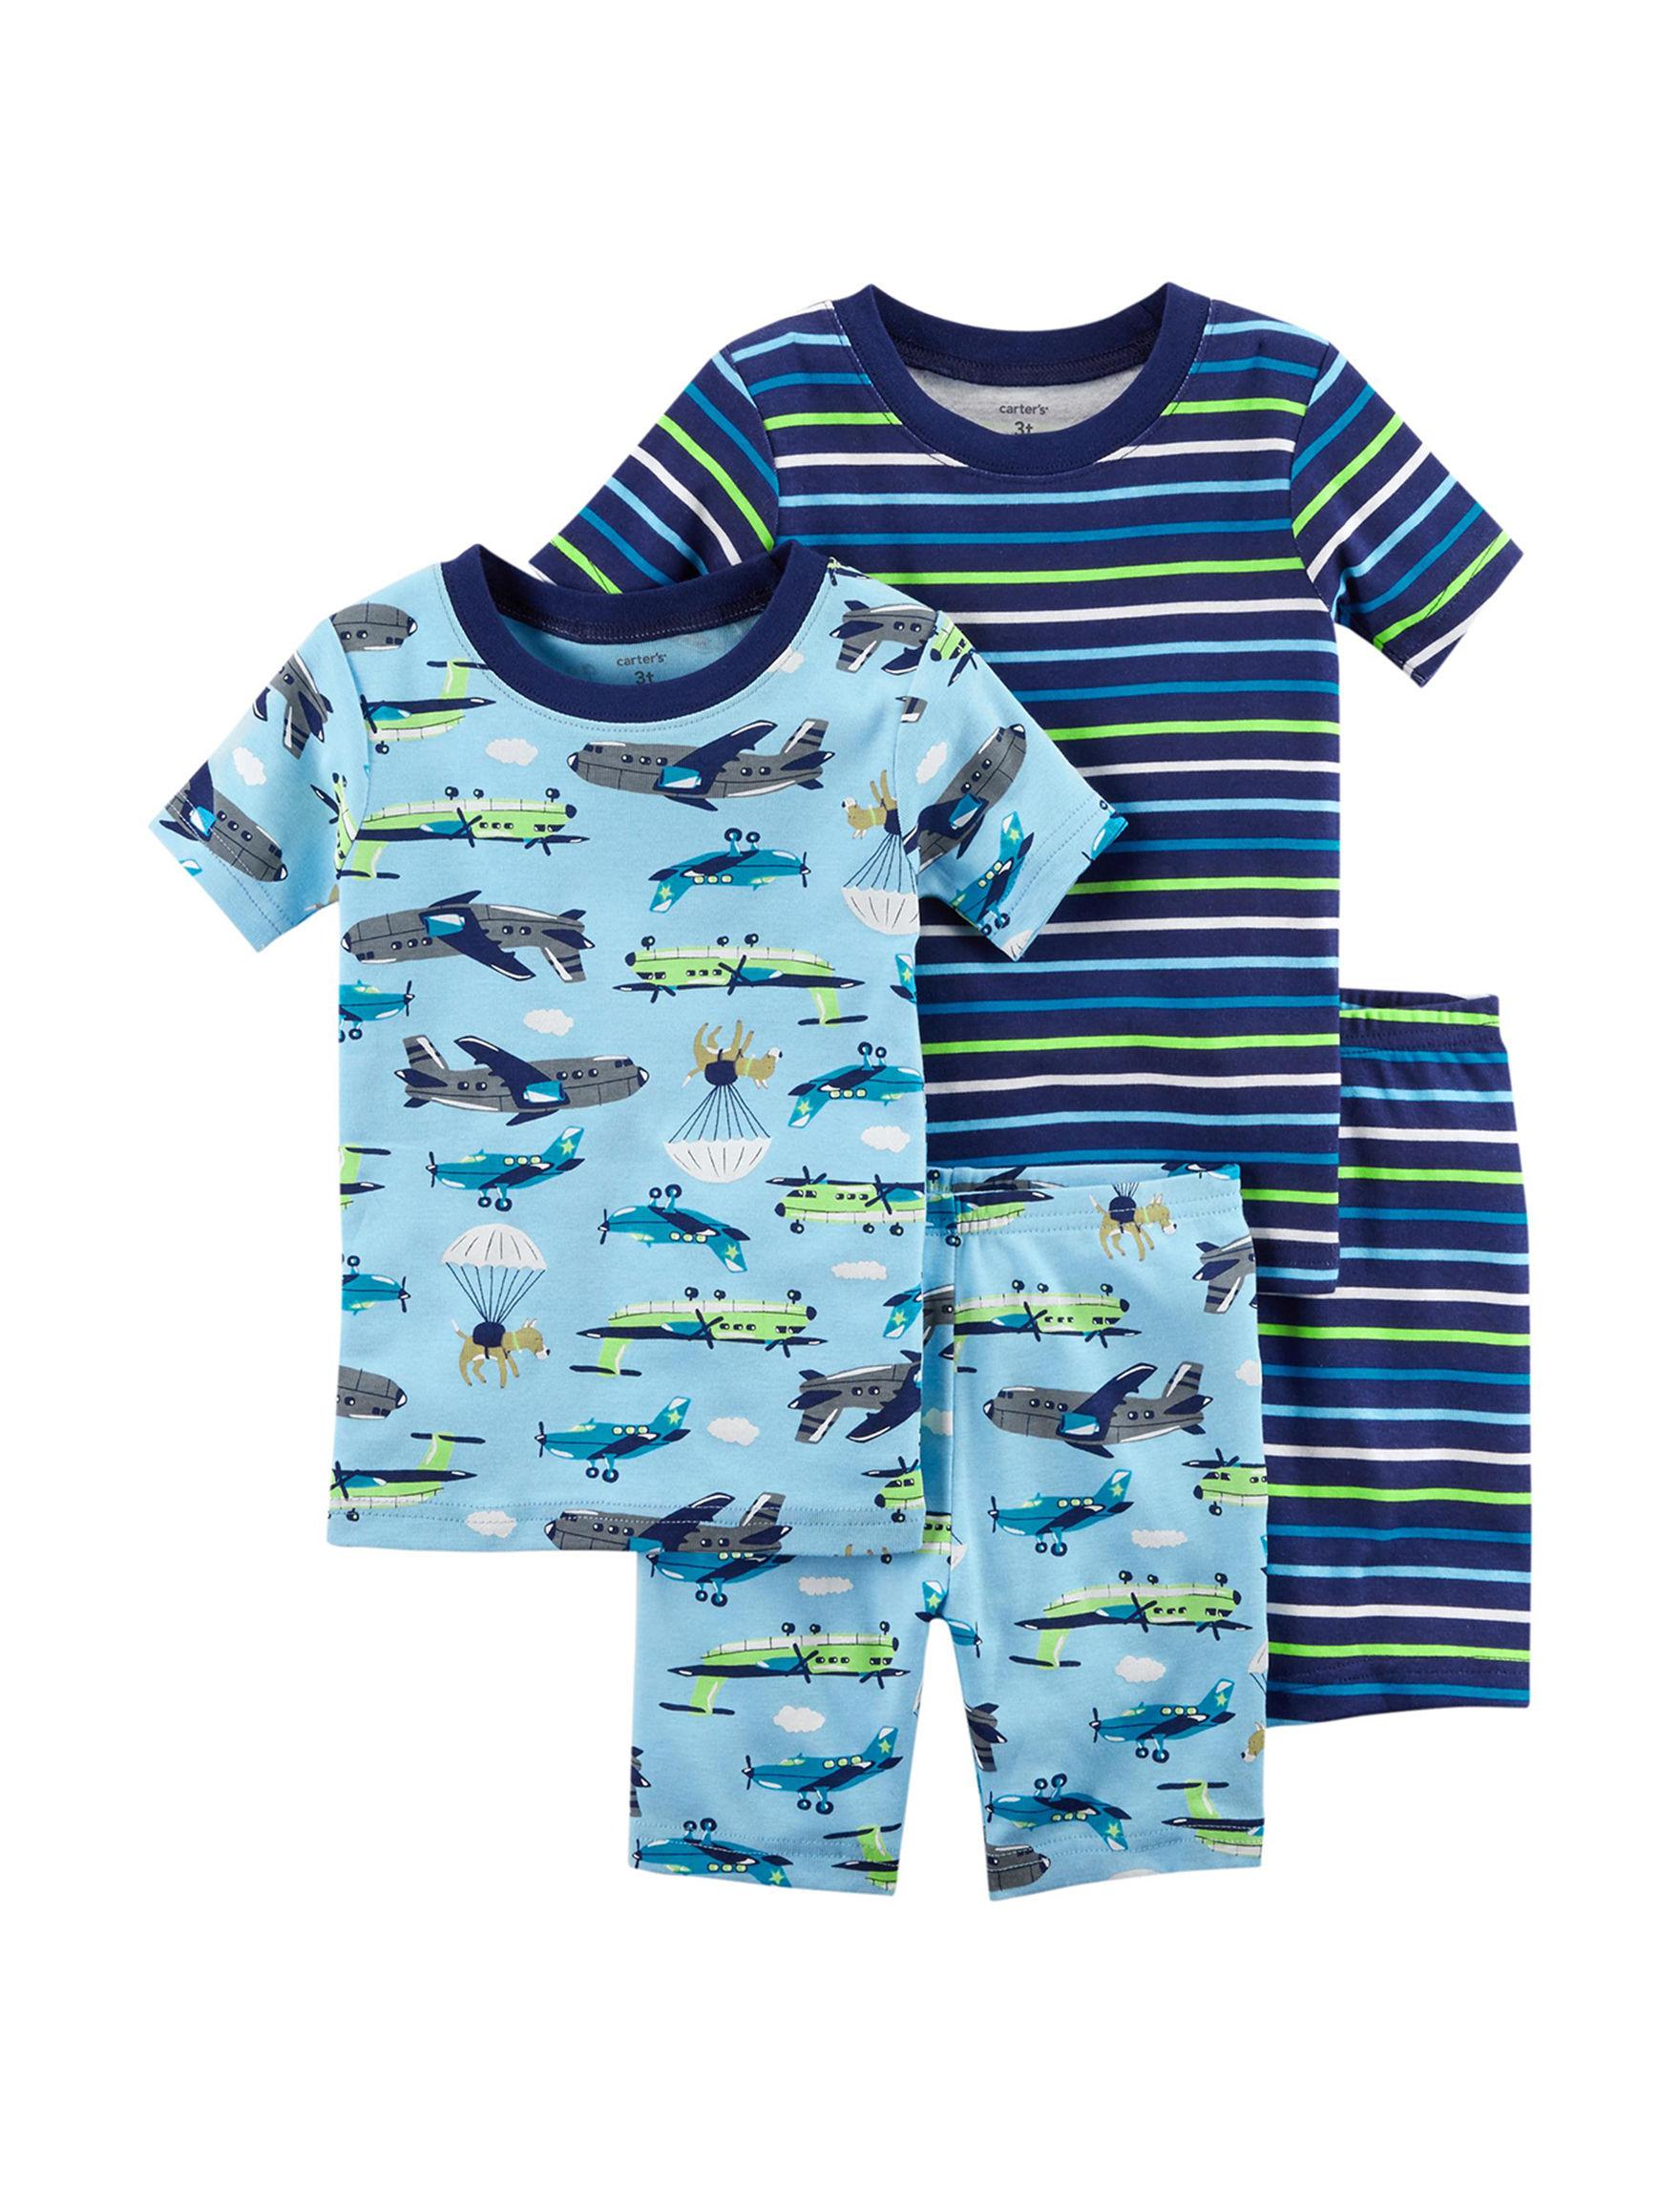 Carter's Blue / Multi Pajama Sets